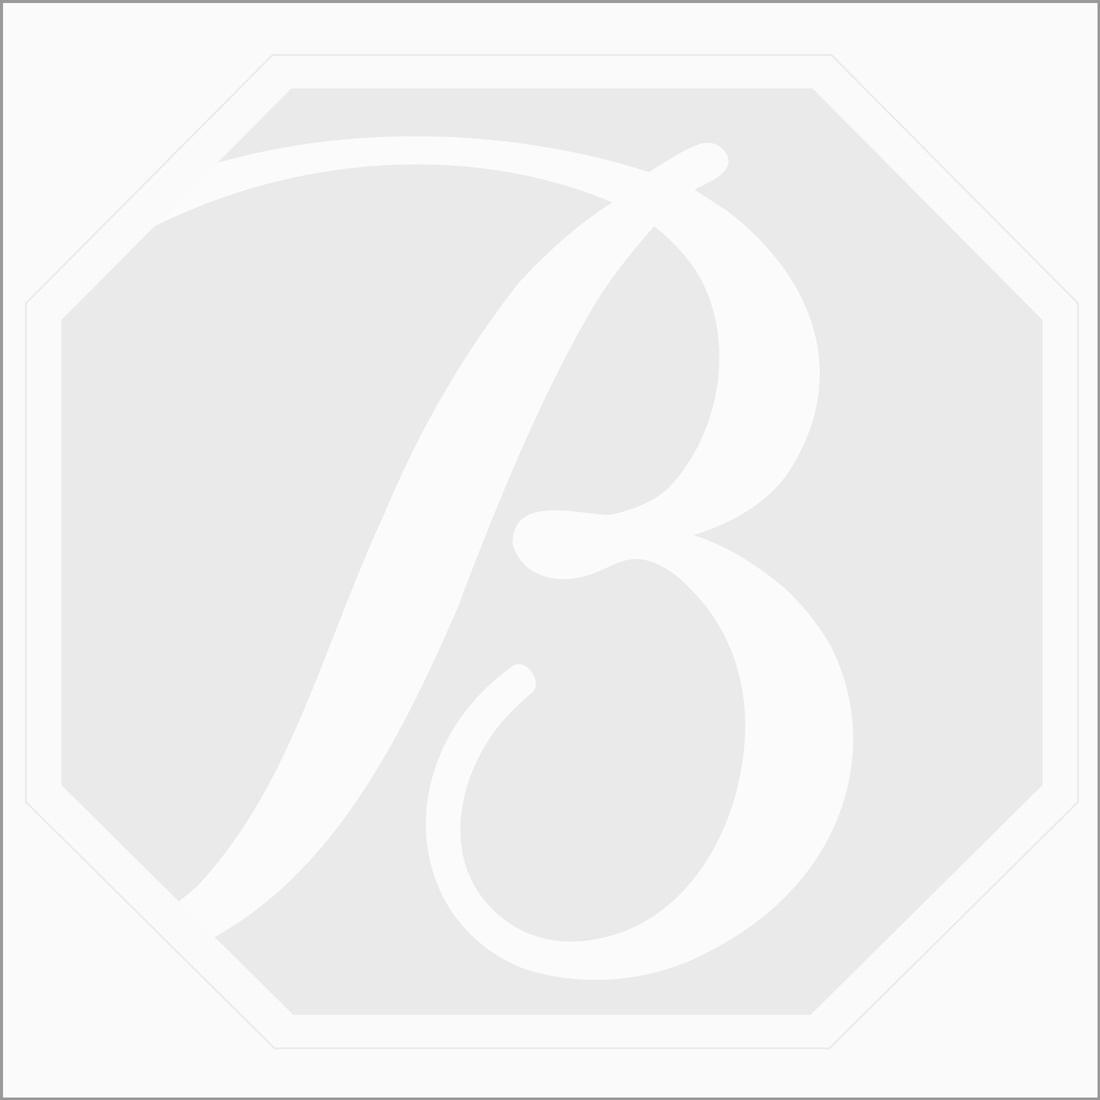 10 x 9 x 3.20 mm - Black Pear Shaped Rose Cut Diamond  - 4.48 carats (FncyDiaRC1129)